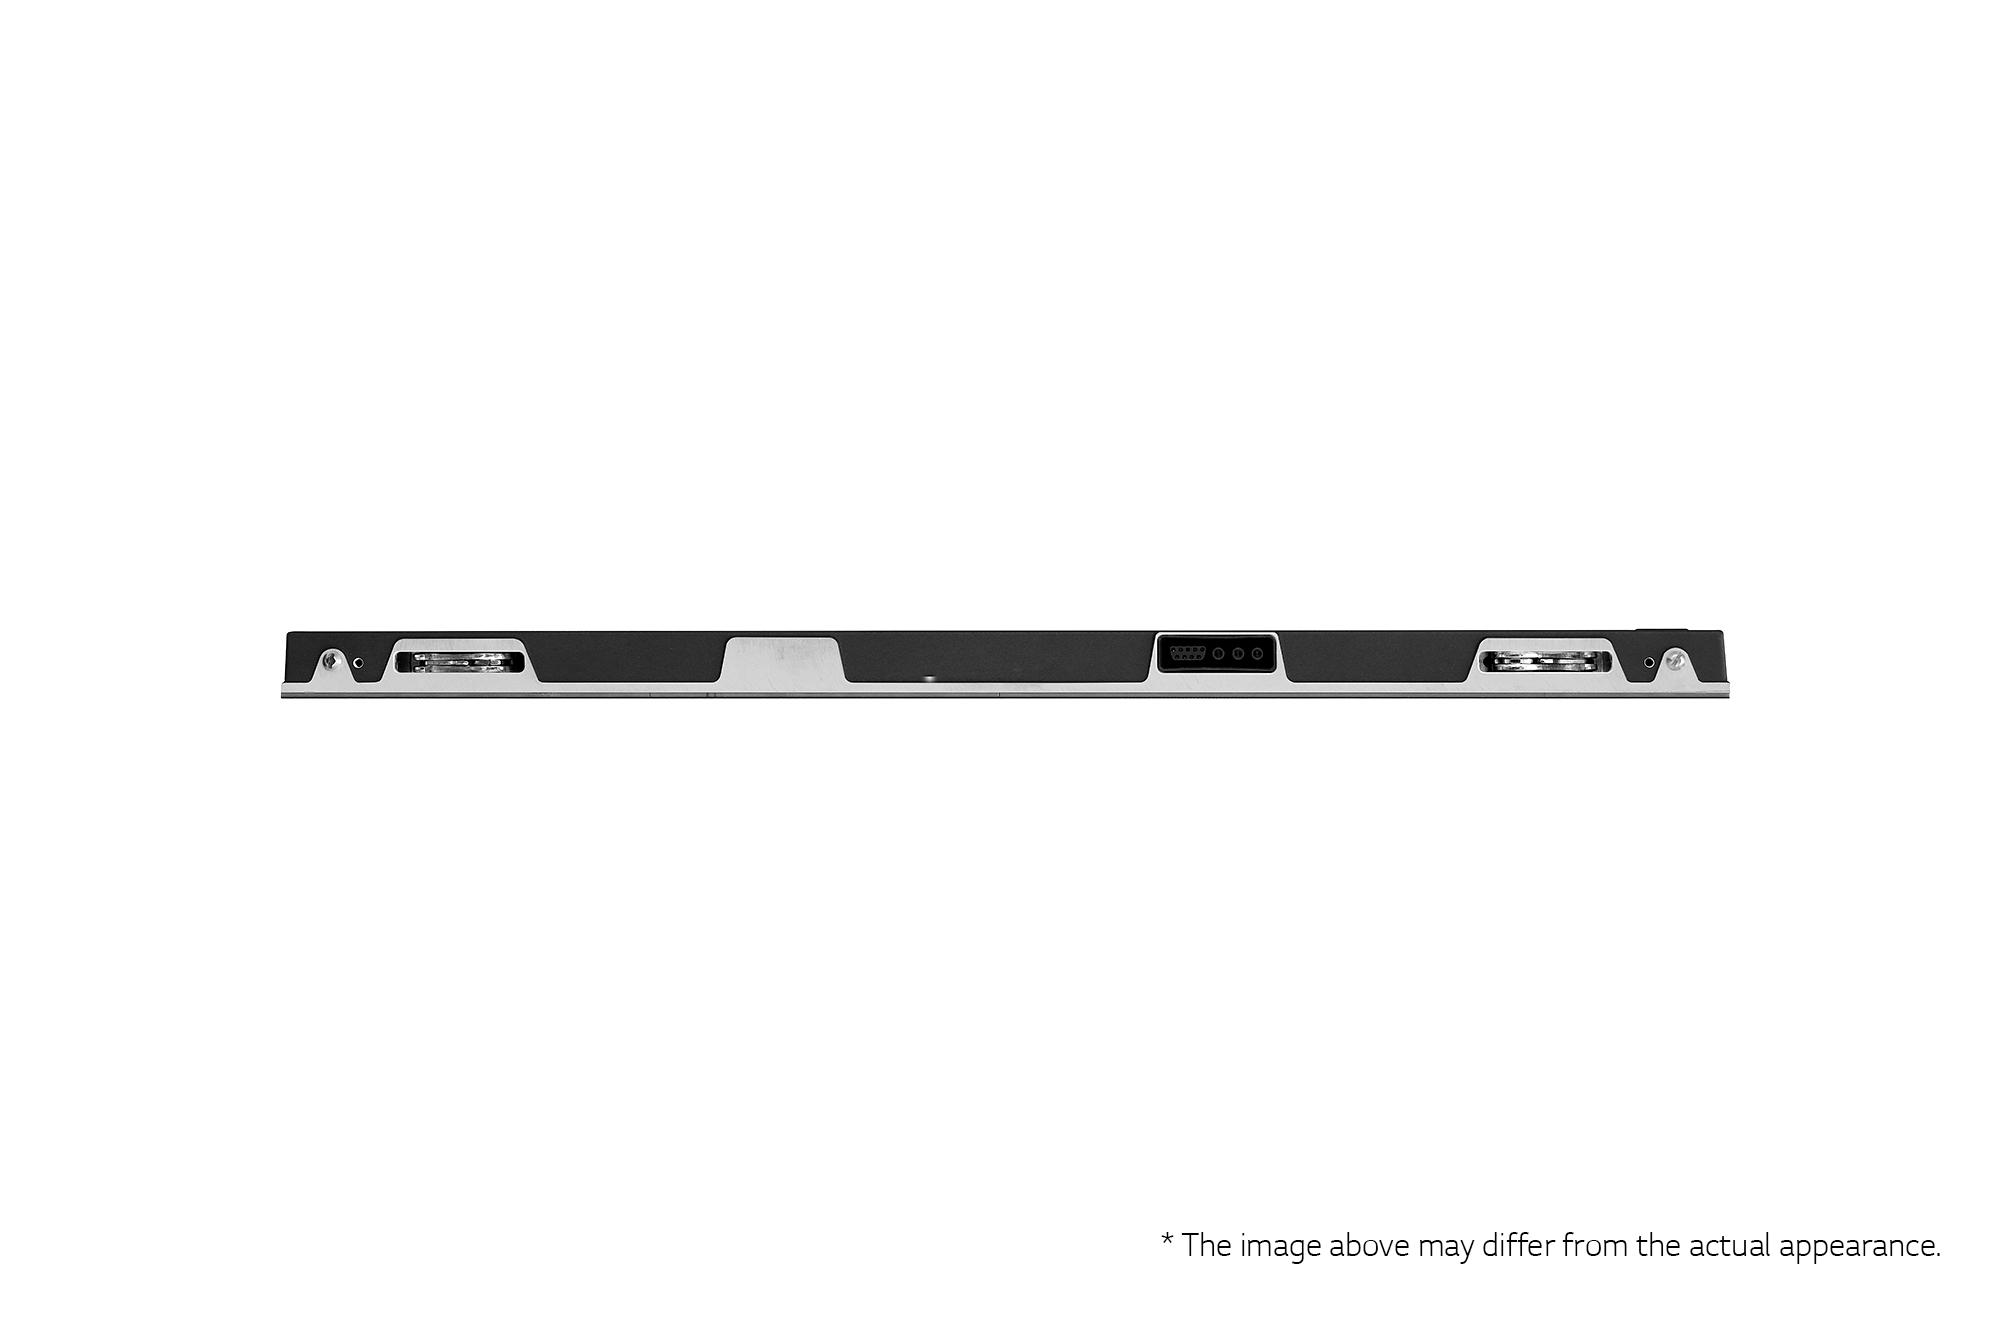 LG Ultra Slim LSCB025 8